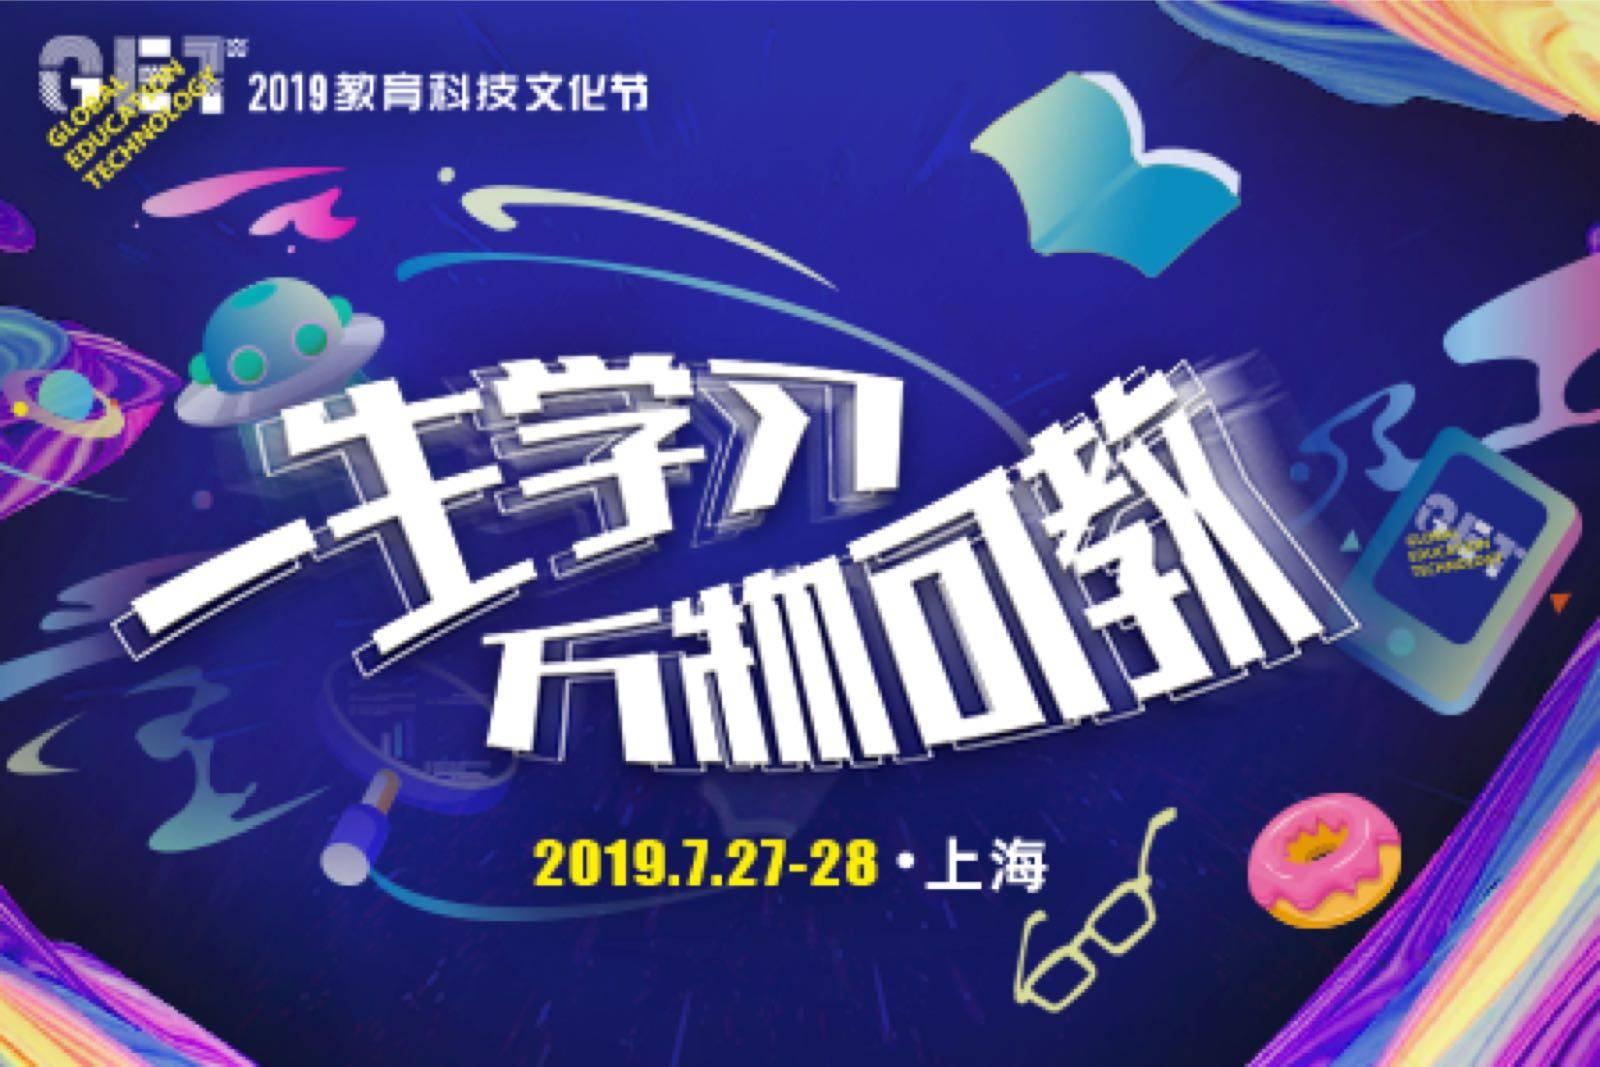 GET2019教育科技文化節